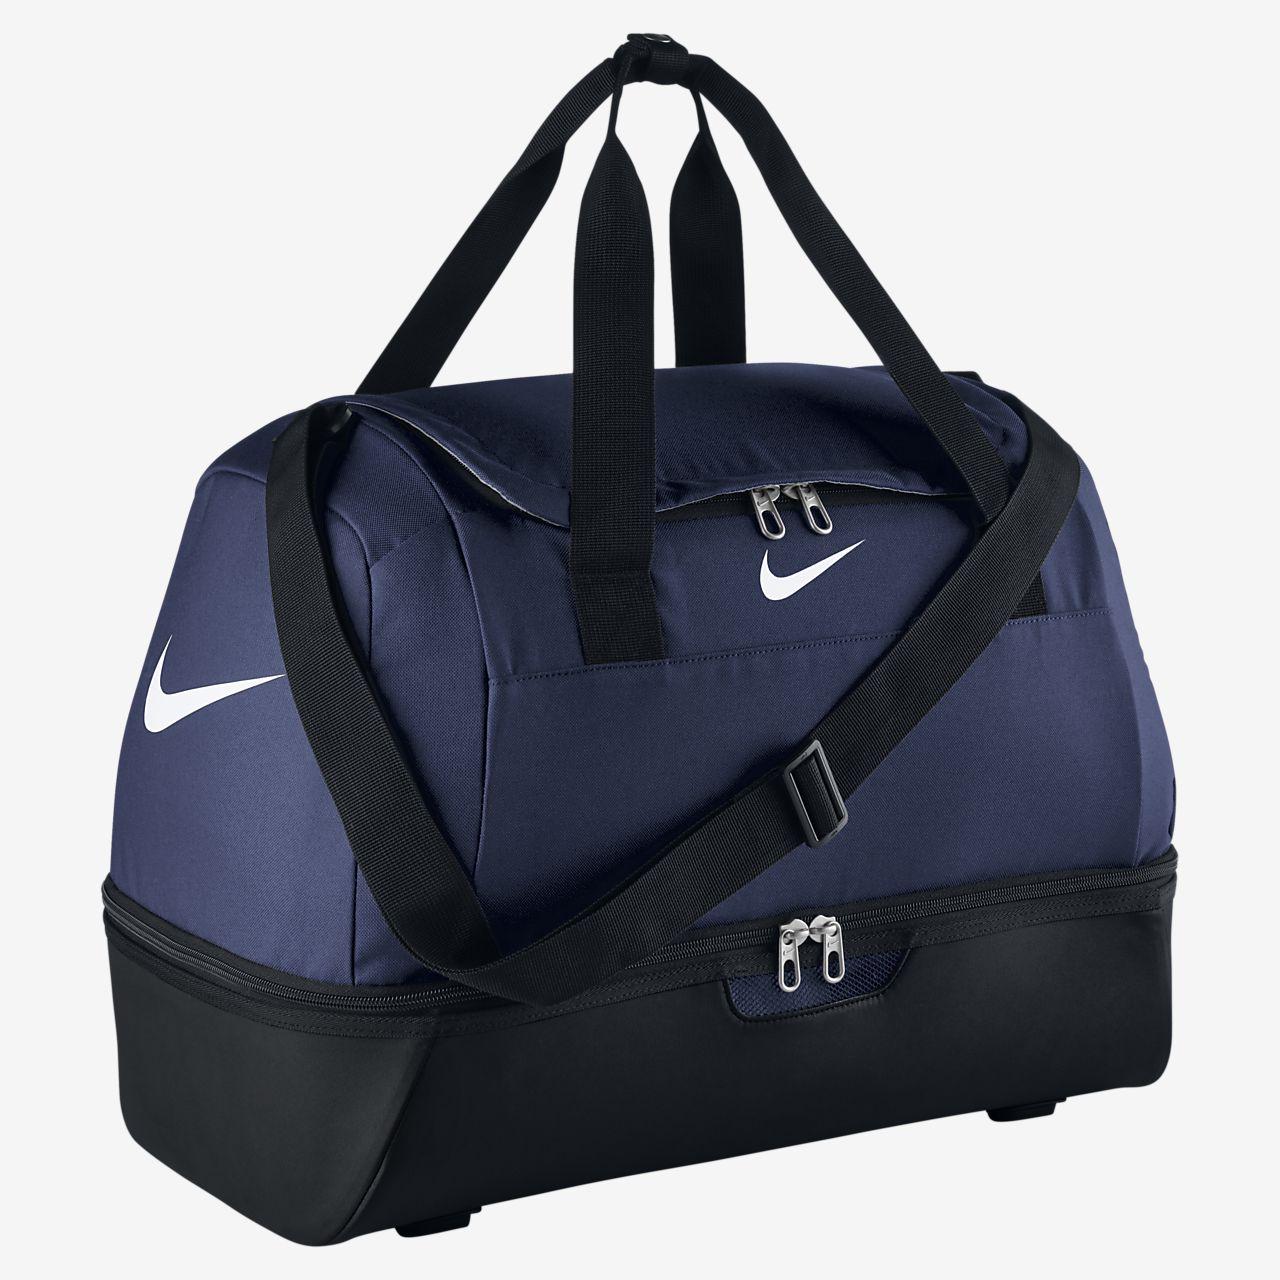 daf311d02c9d Nike Football Club Team Hardcase (Medium) Duffel Bag. Nike.com ZA